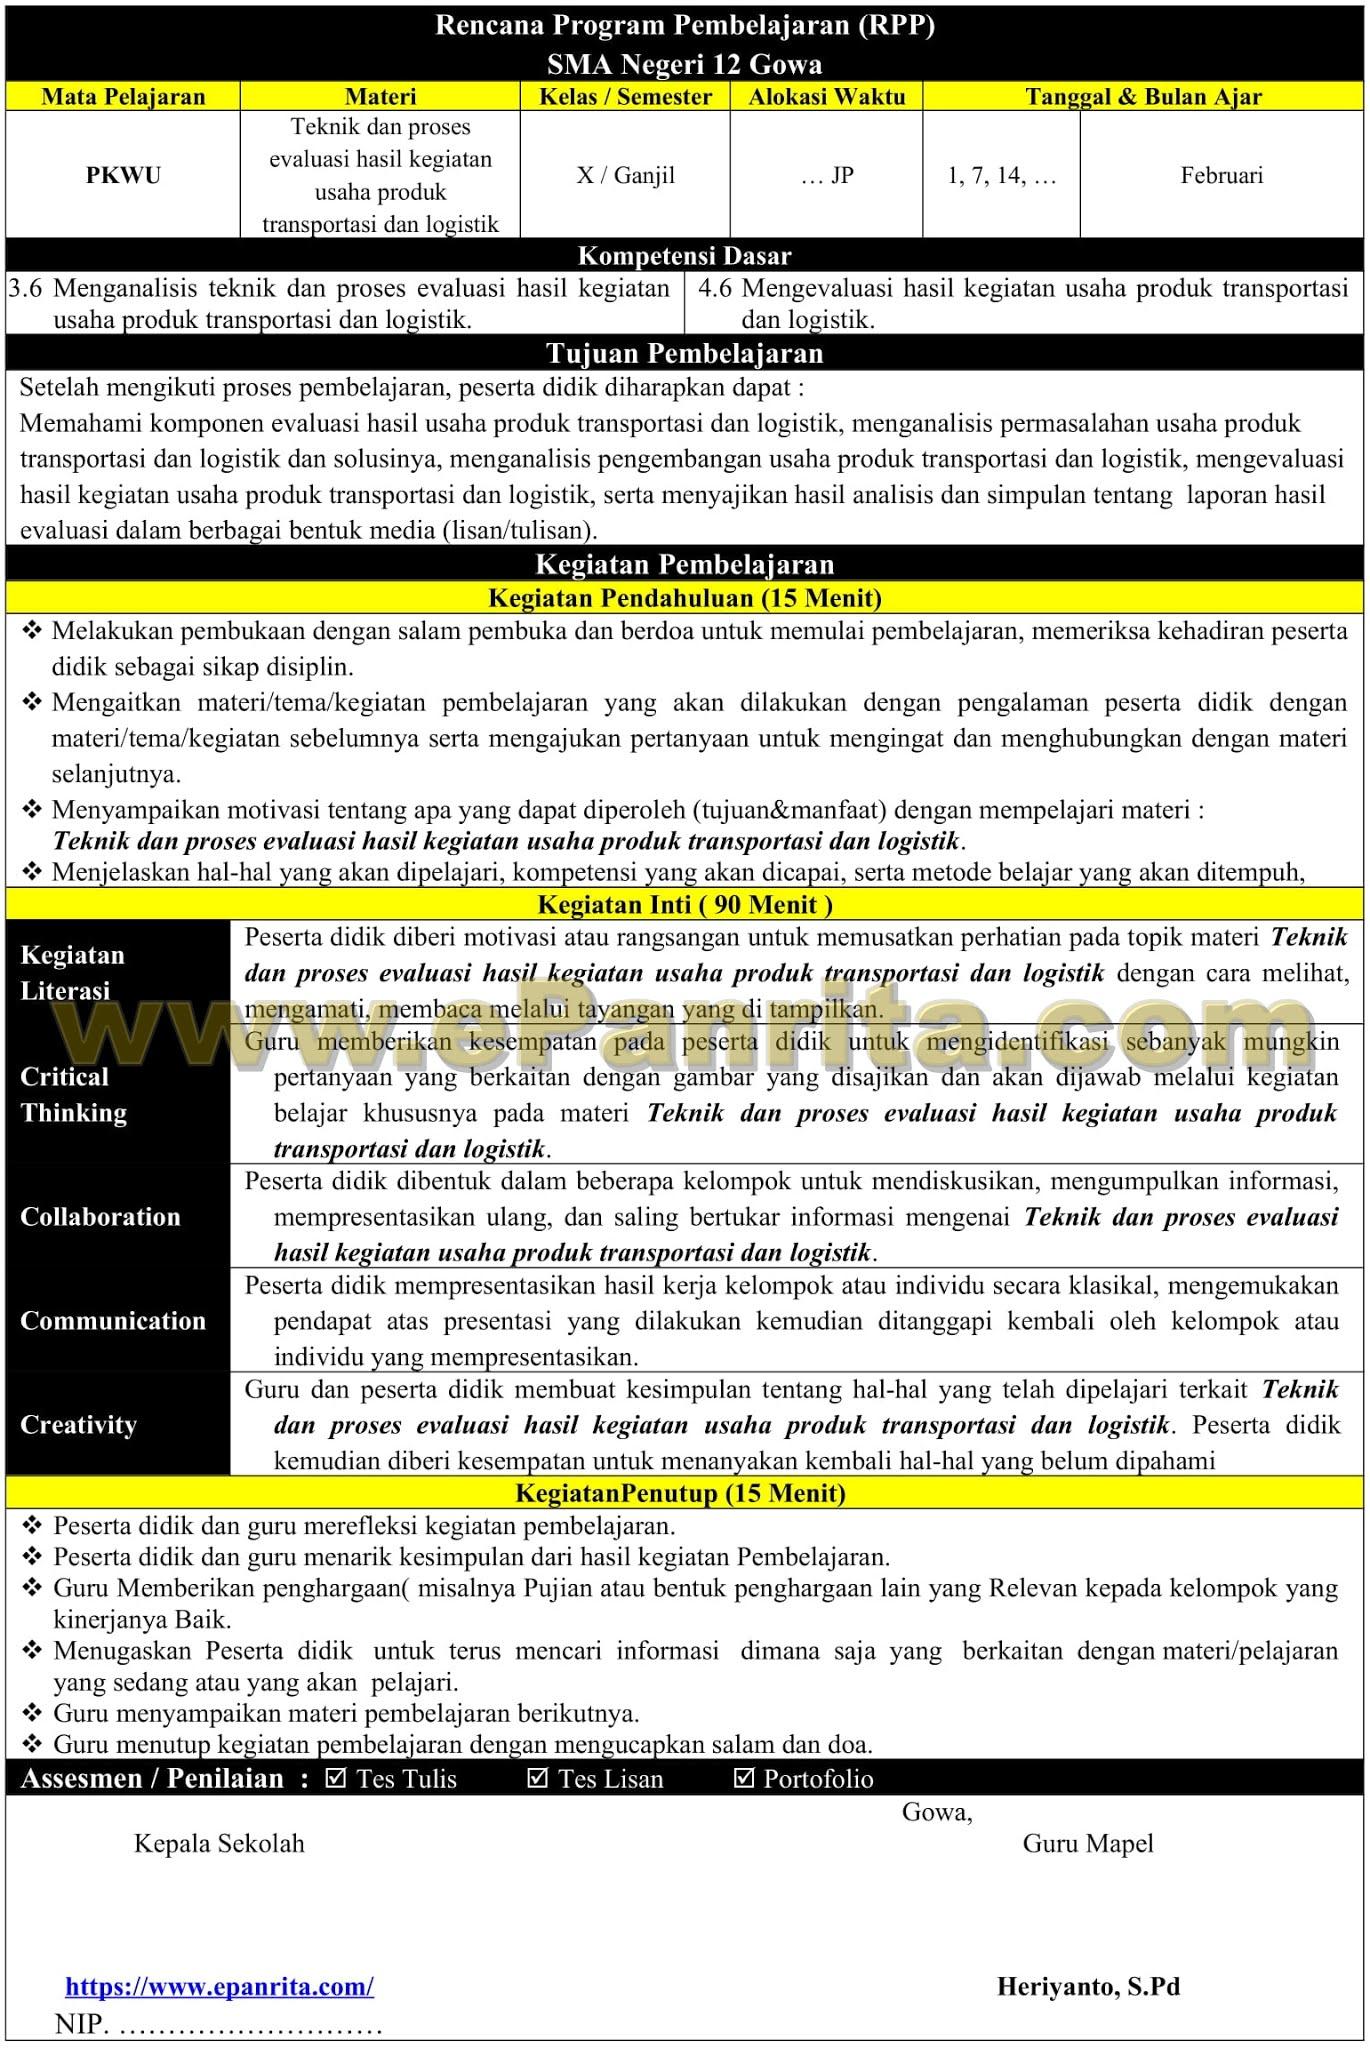 RPP 1 Halaman Prakarya Aspek Rekayasa (Teknik dan proses evaluasi hasil kegiatan usaha produk transportasi dan logistik)